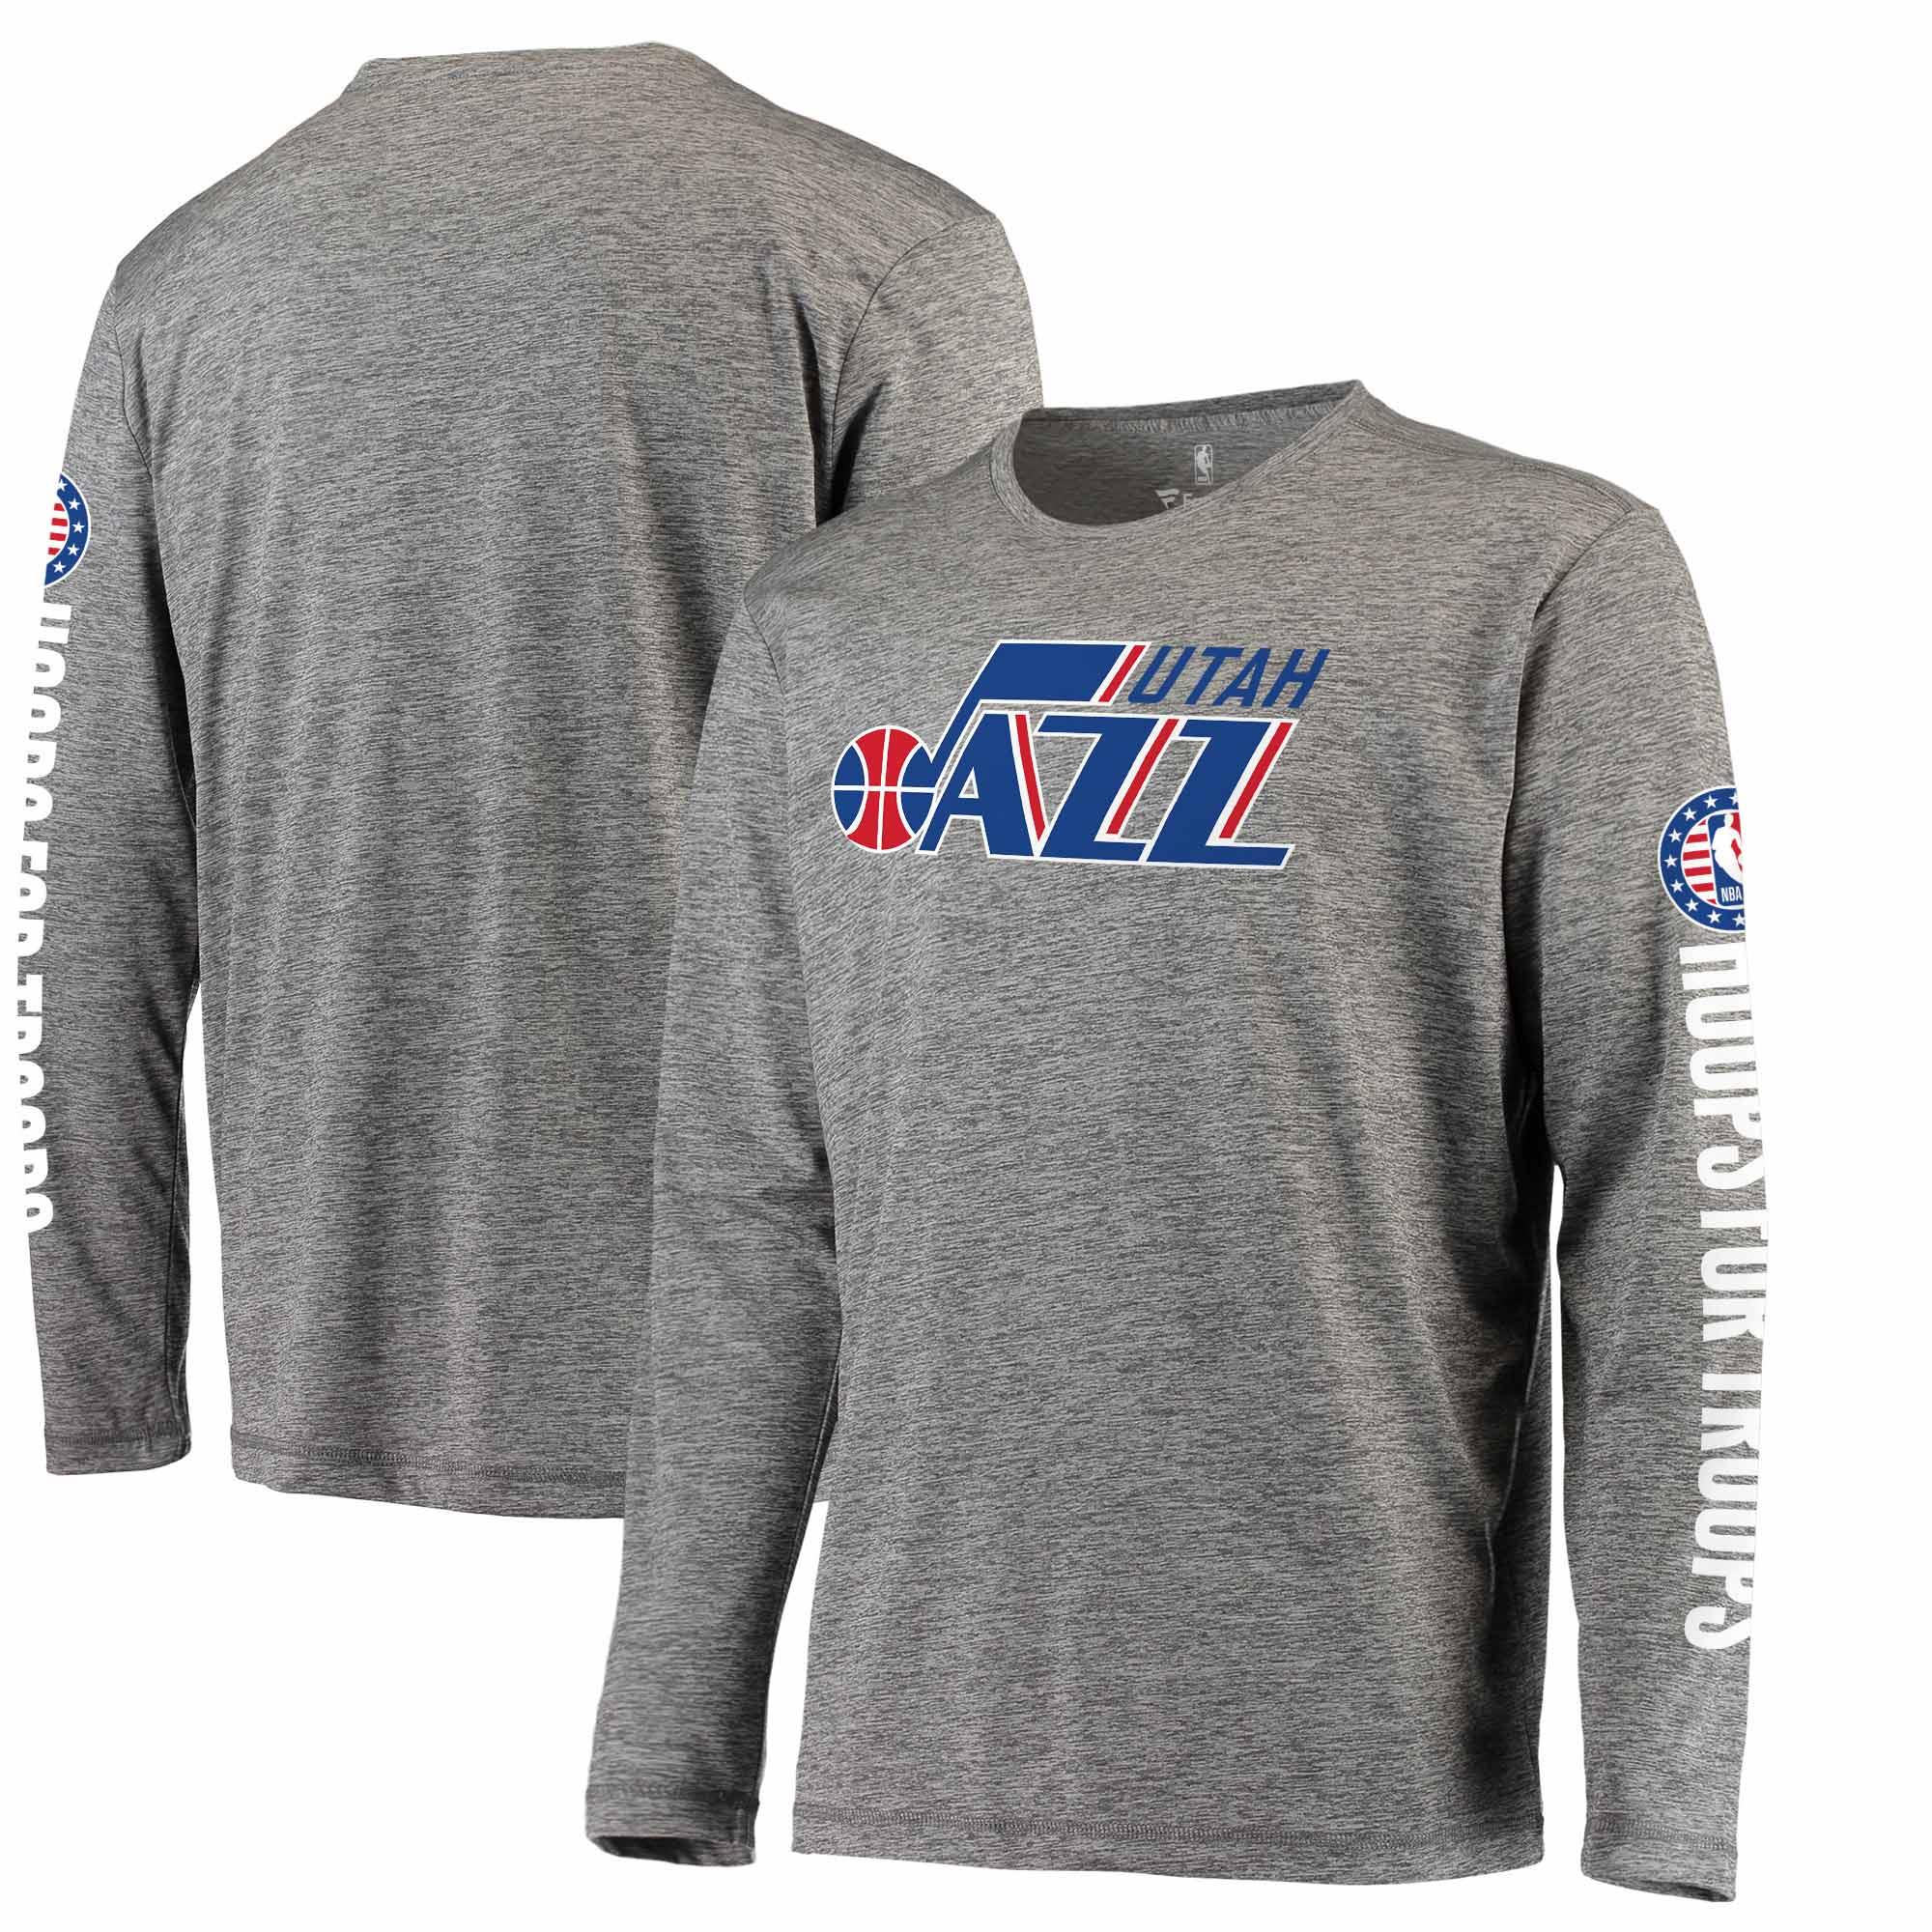 Utah Jazz Fanatics Branded Hoops for Troops Long Sleeve T-Shirt - Heathered Gray